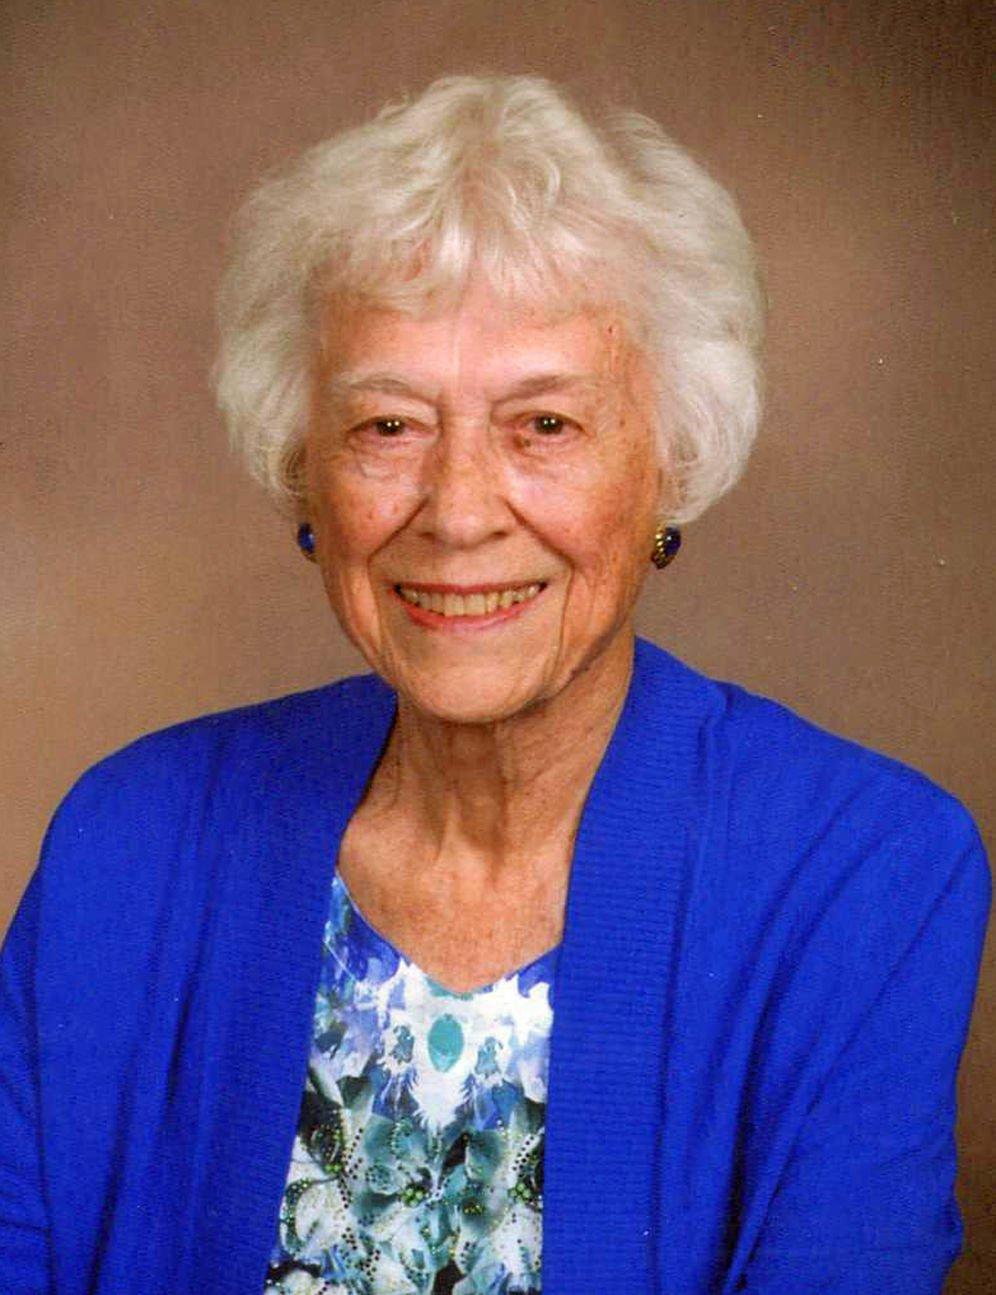 Happy 90th birthday, Phyllis Frickel